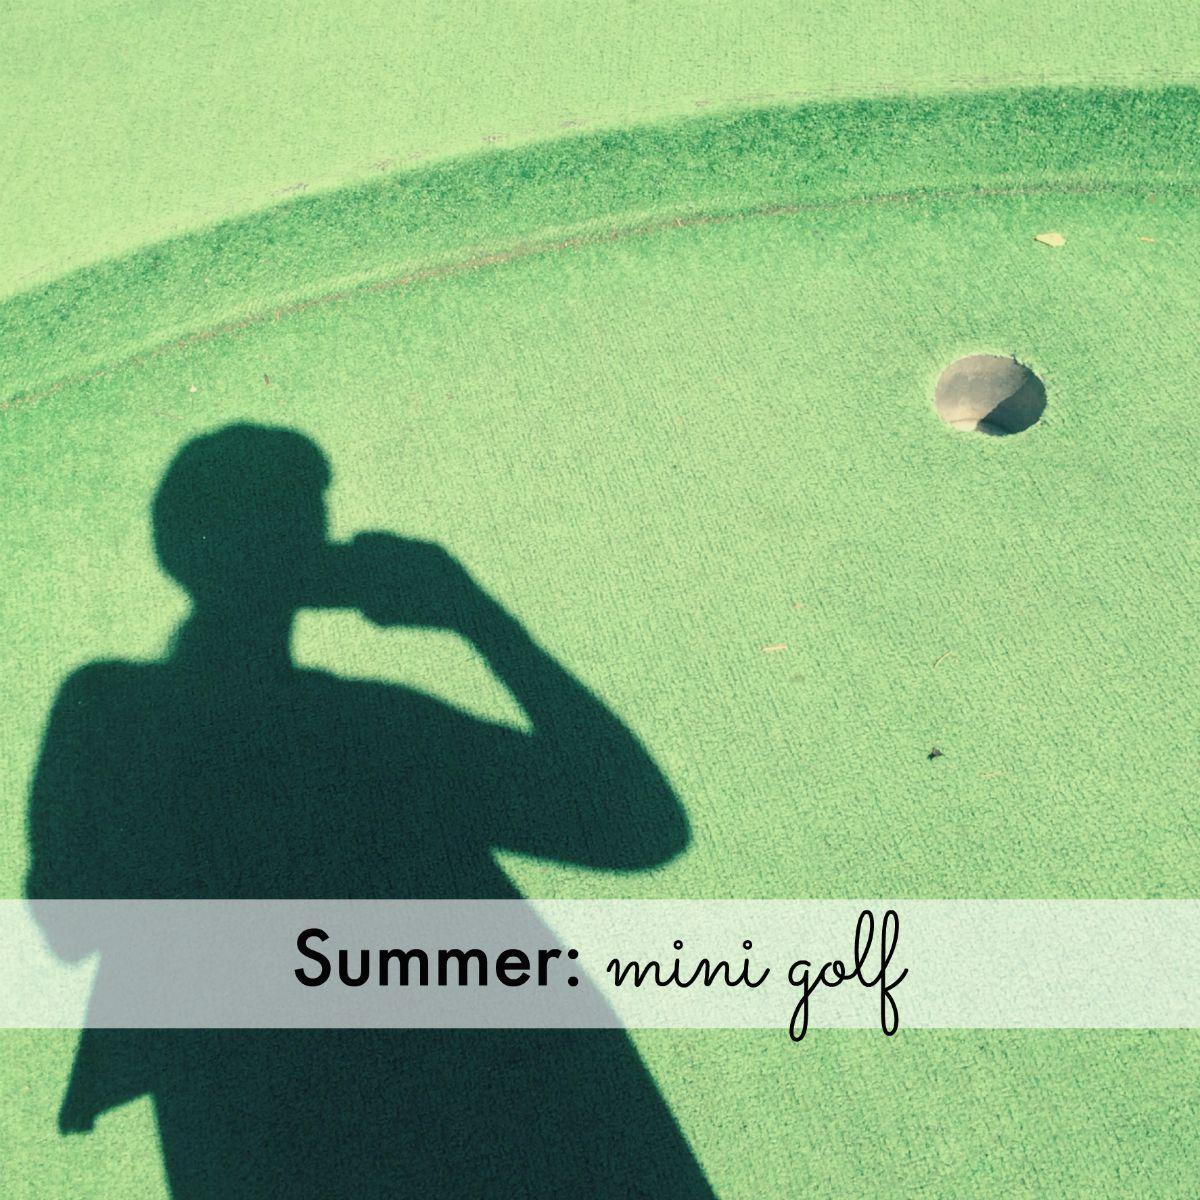 Summer: mini golf